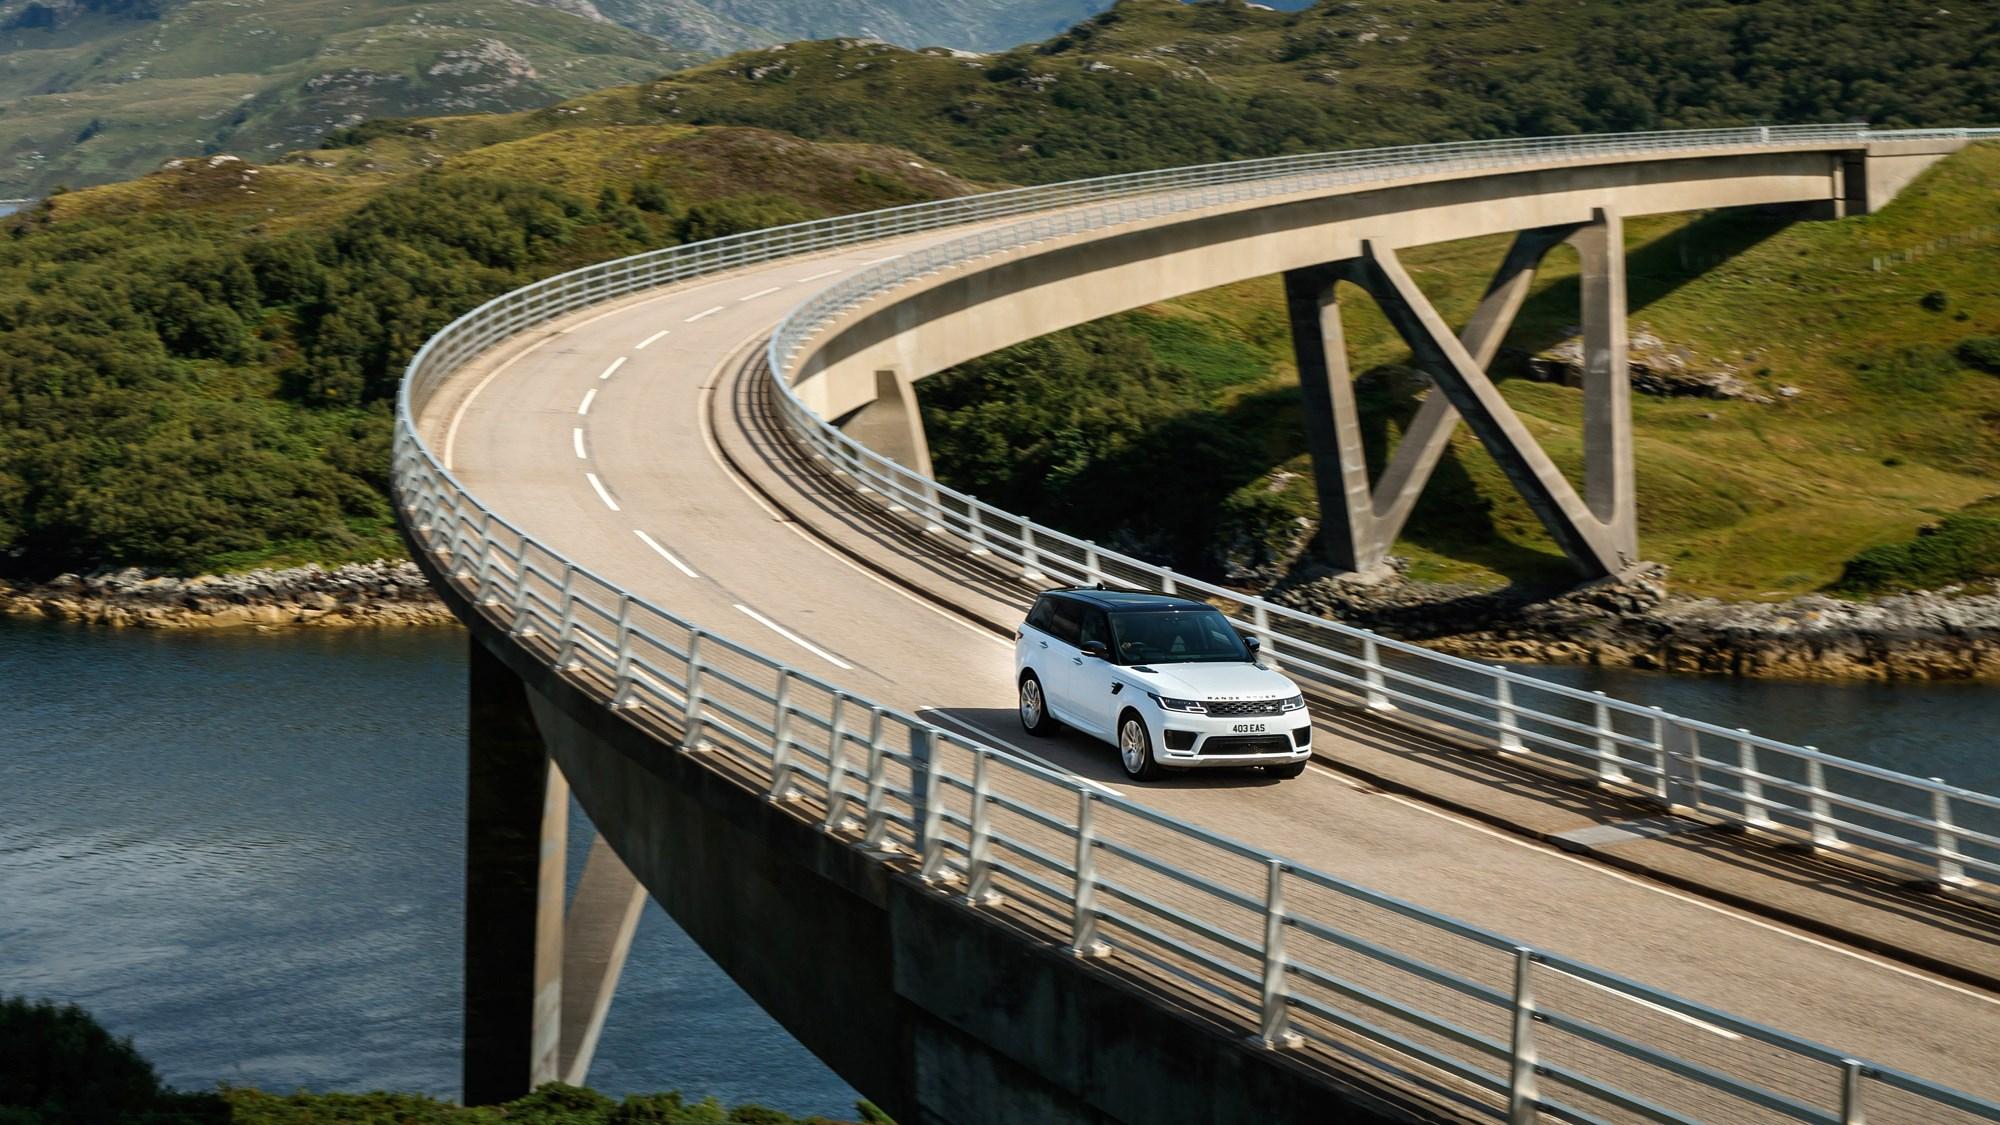 White Land Rover Range Rover Sport D350 driving on Kylesku Bridge